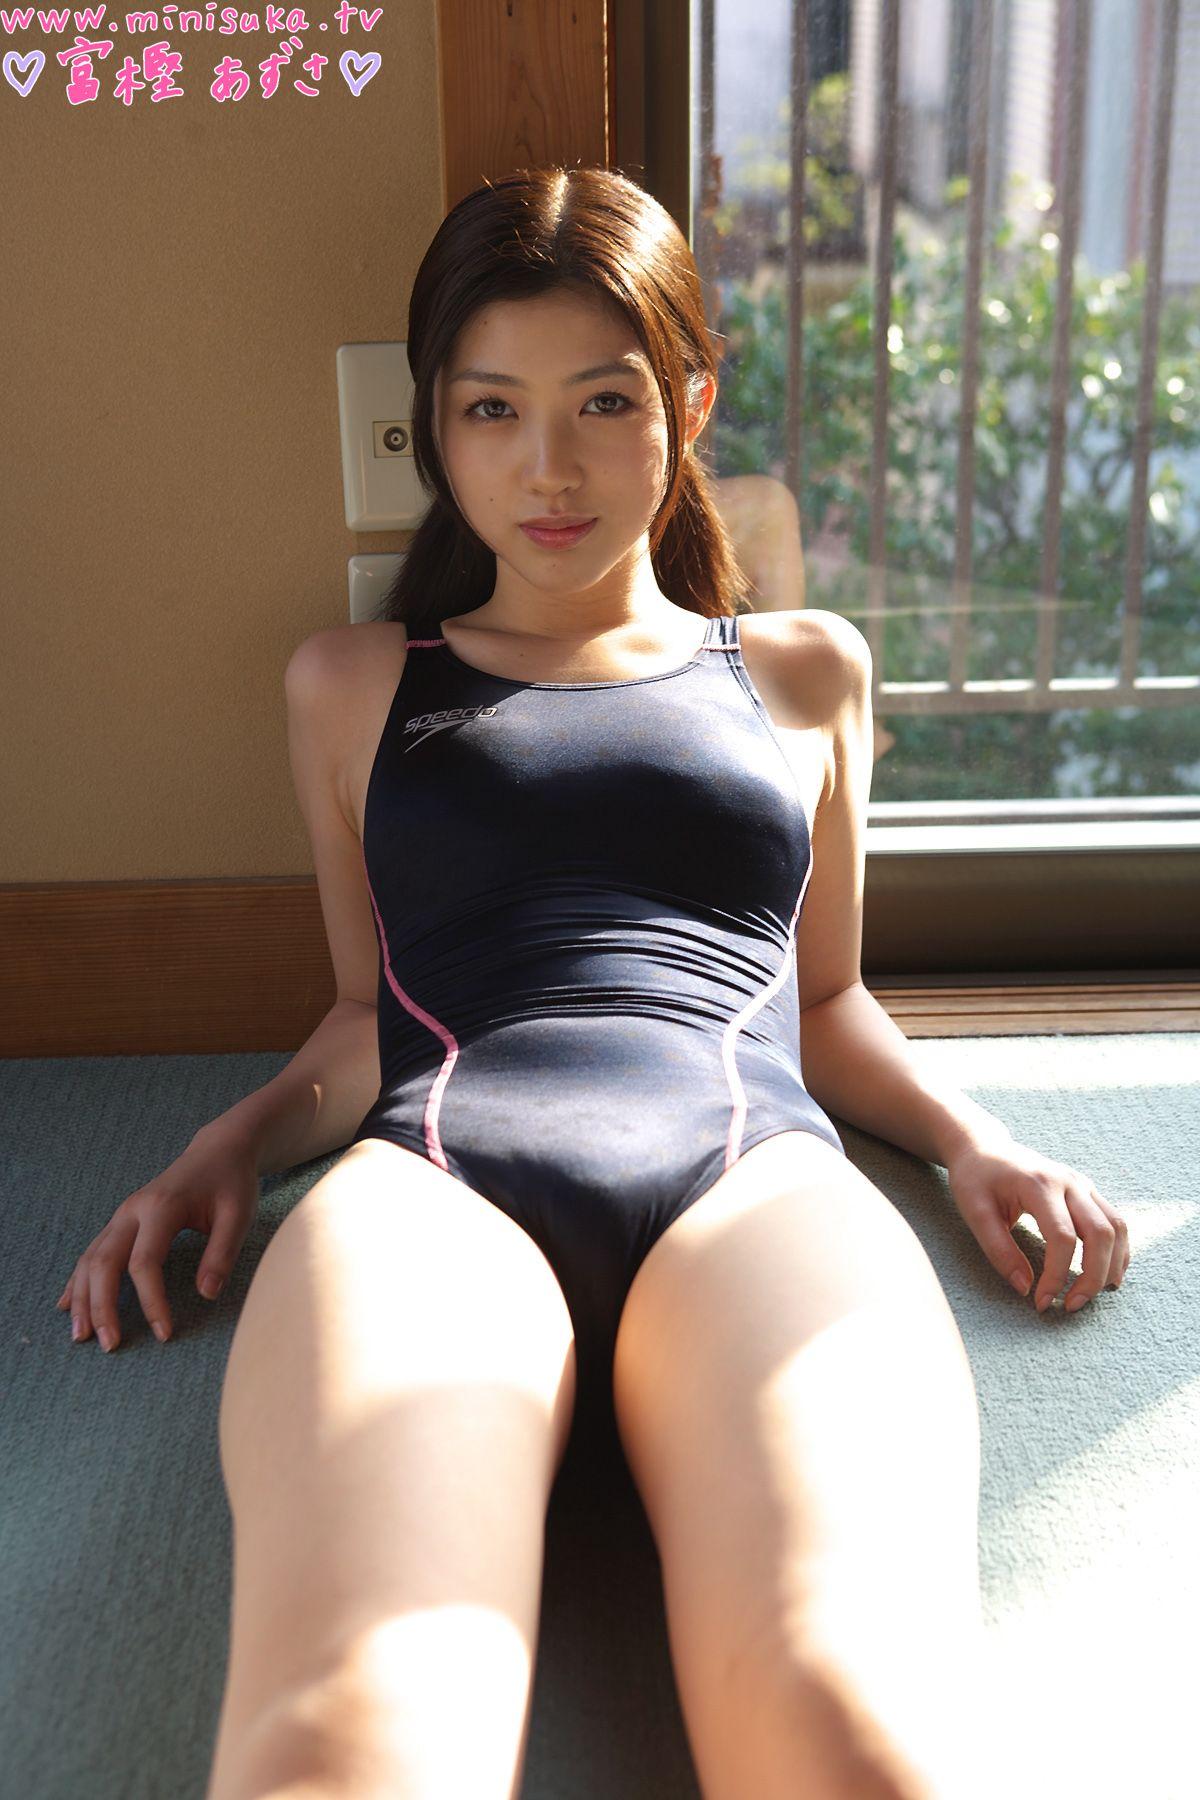 Azusa Togashi (b. 1990) nude photos 2019